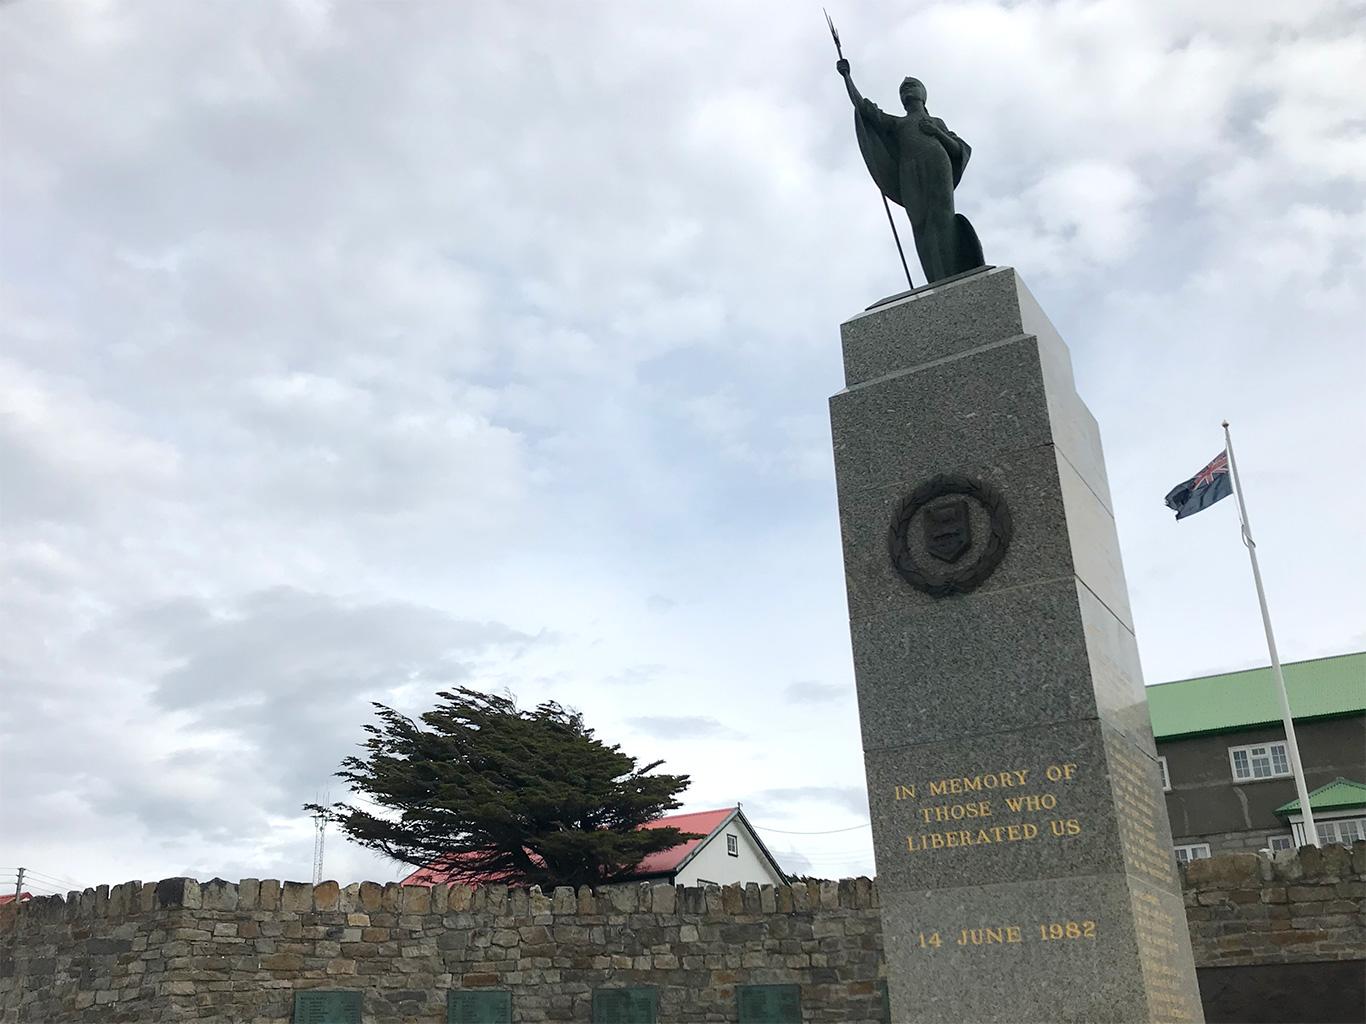 War Monument, Port Stanley, Falkland Islands.